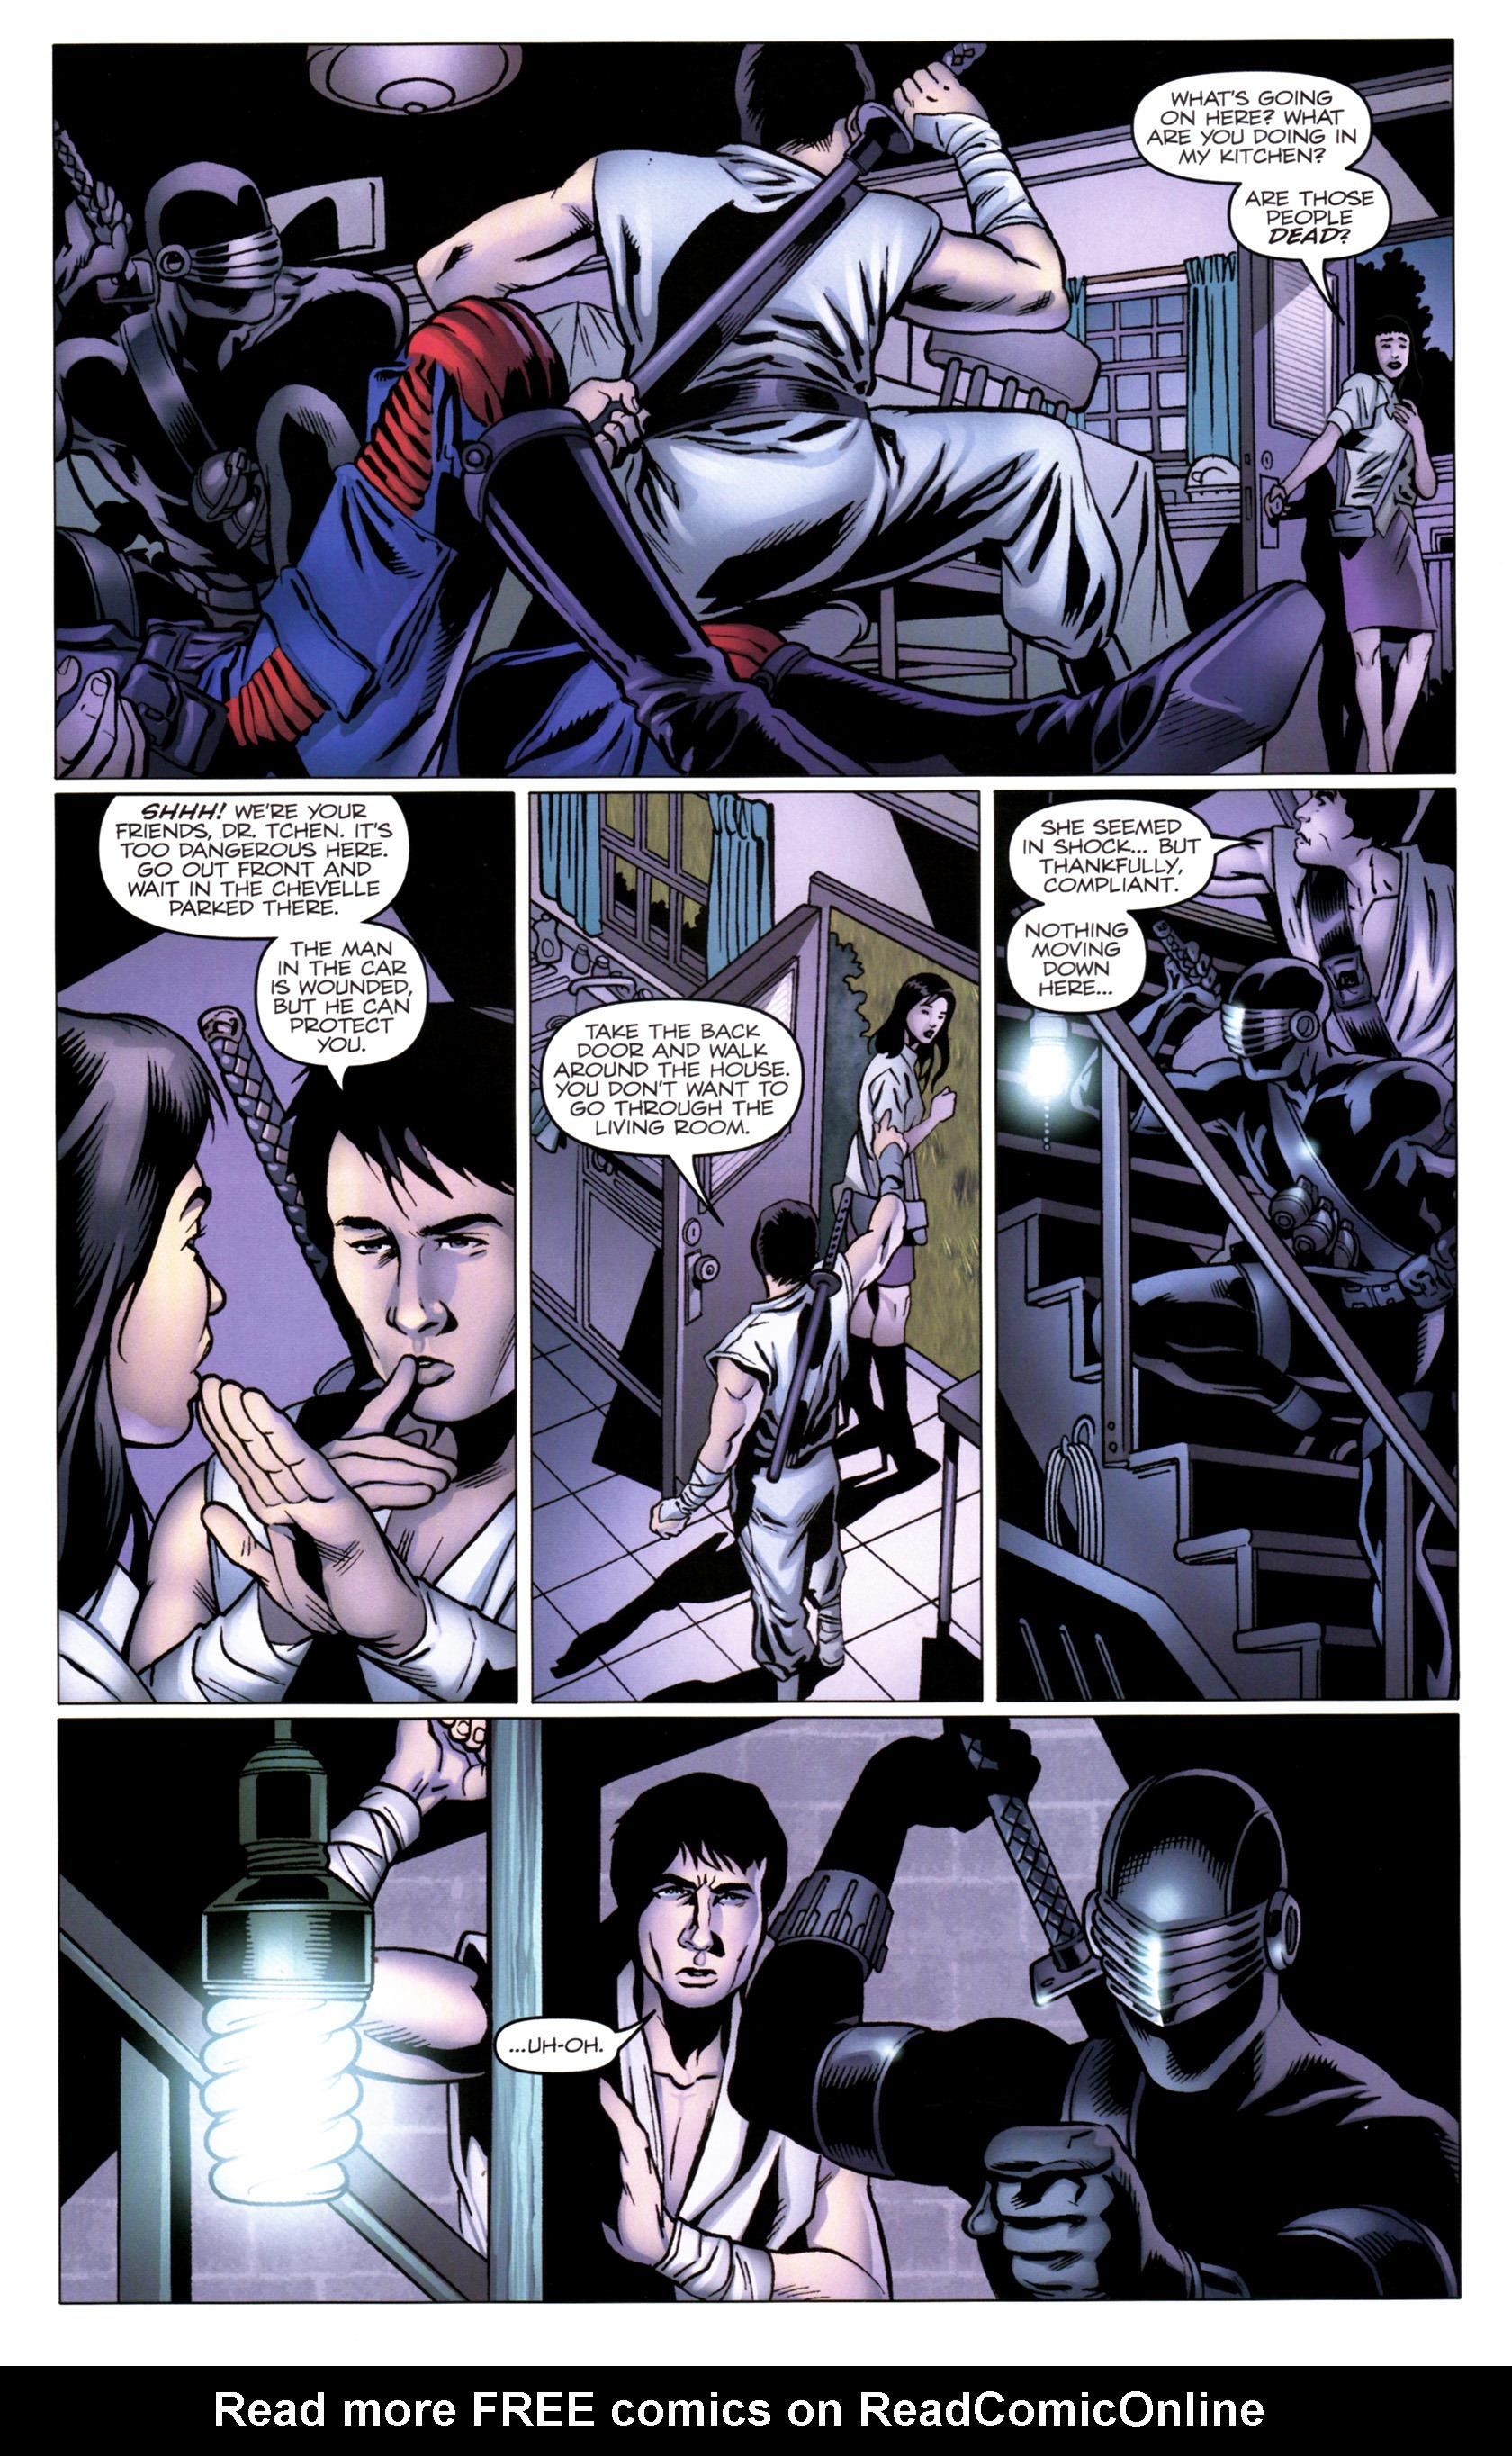 G.I. Joe: A Real American Hero 176 Page 12